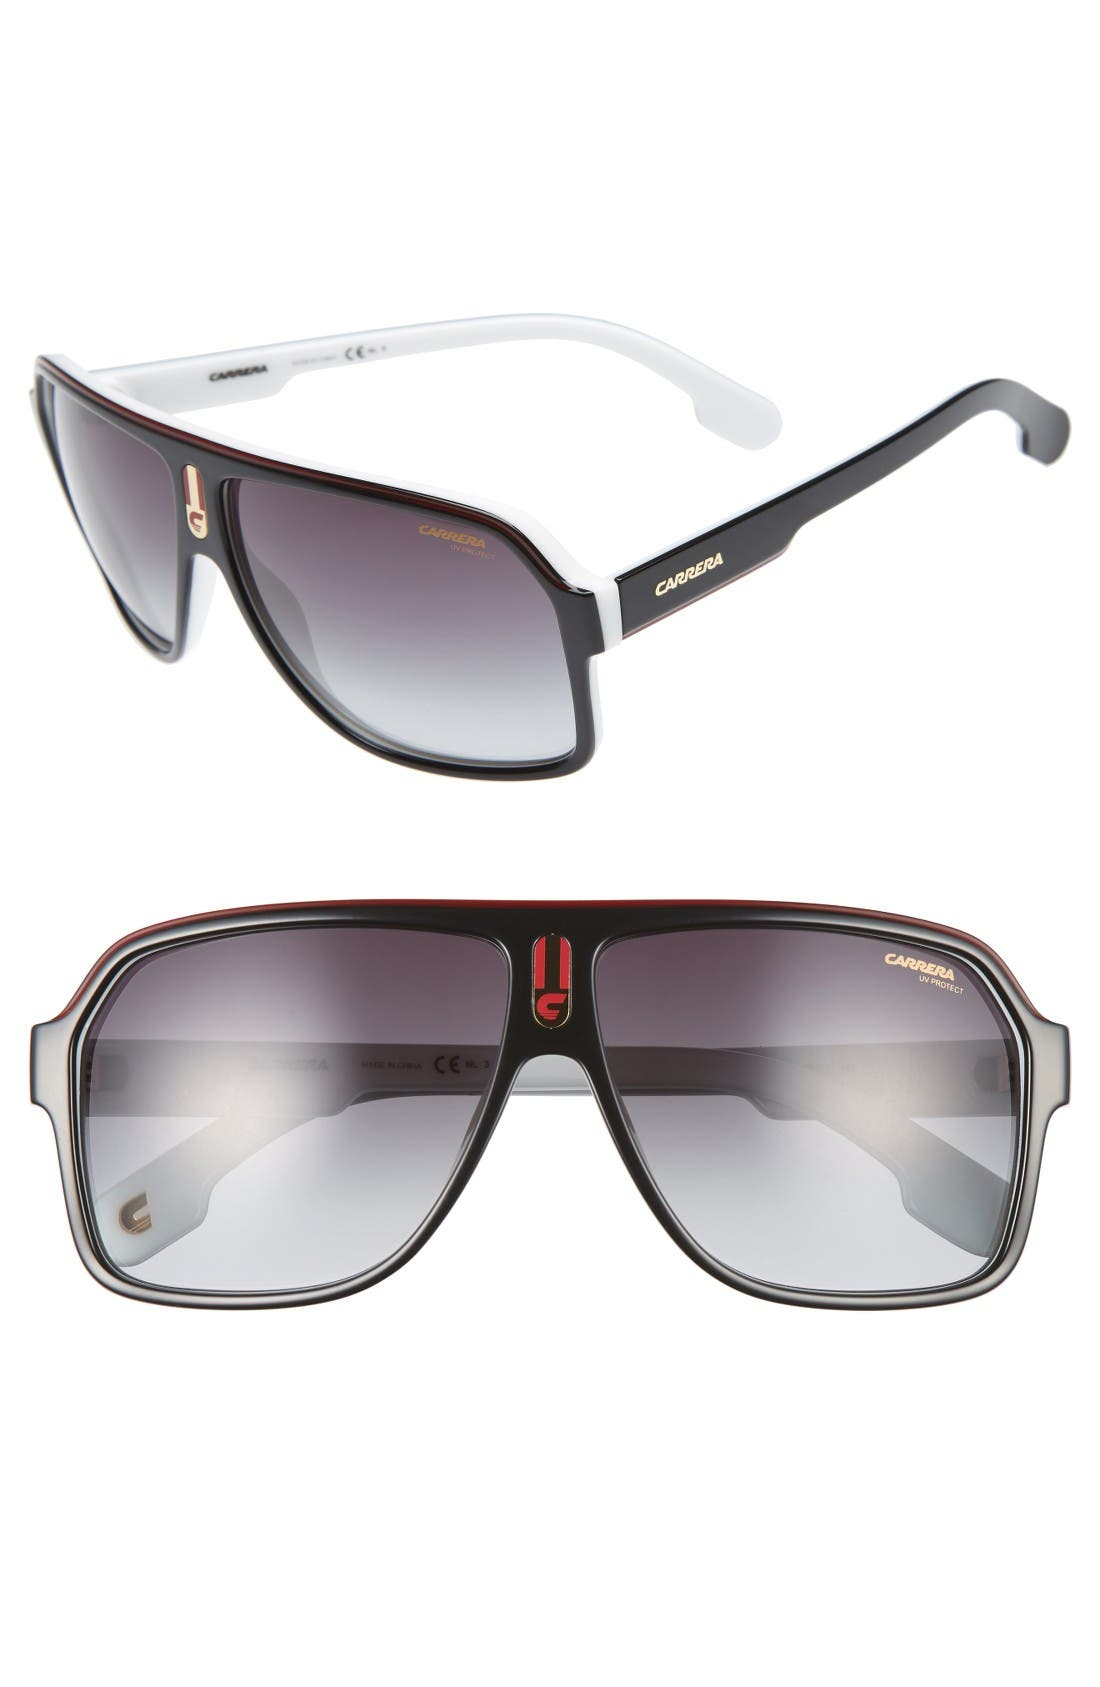 62mm Aviator Sunglasses,                         Main,                         color, Black White